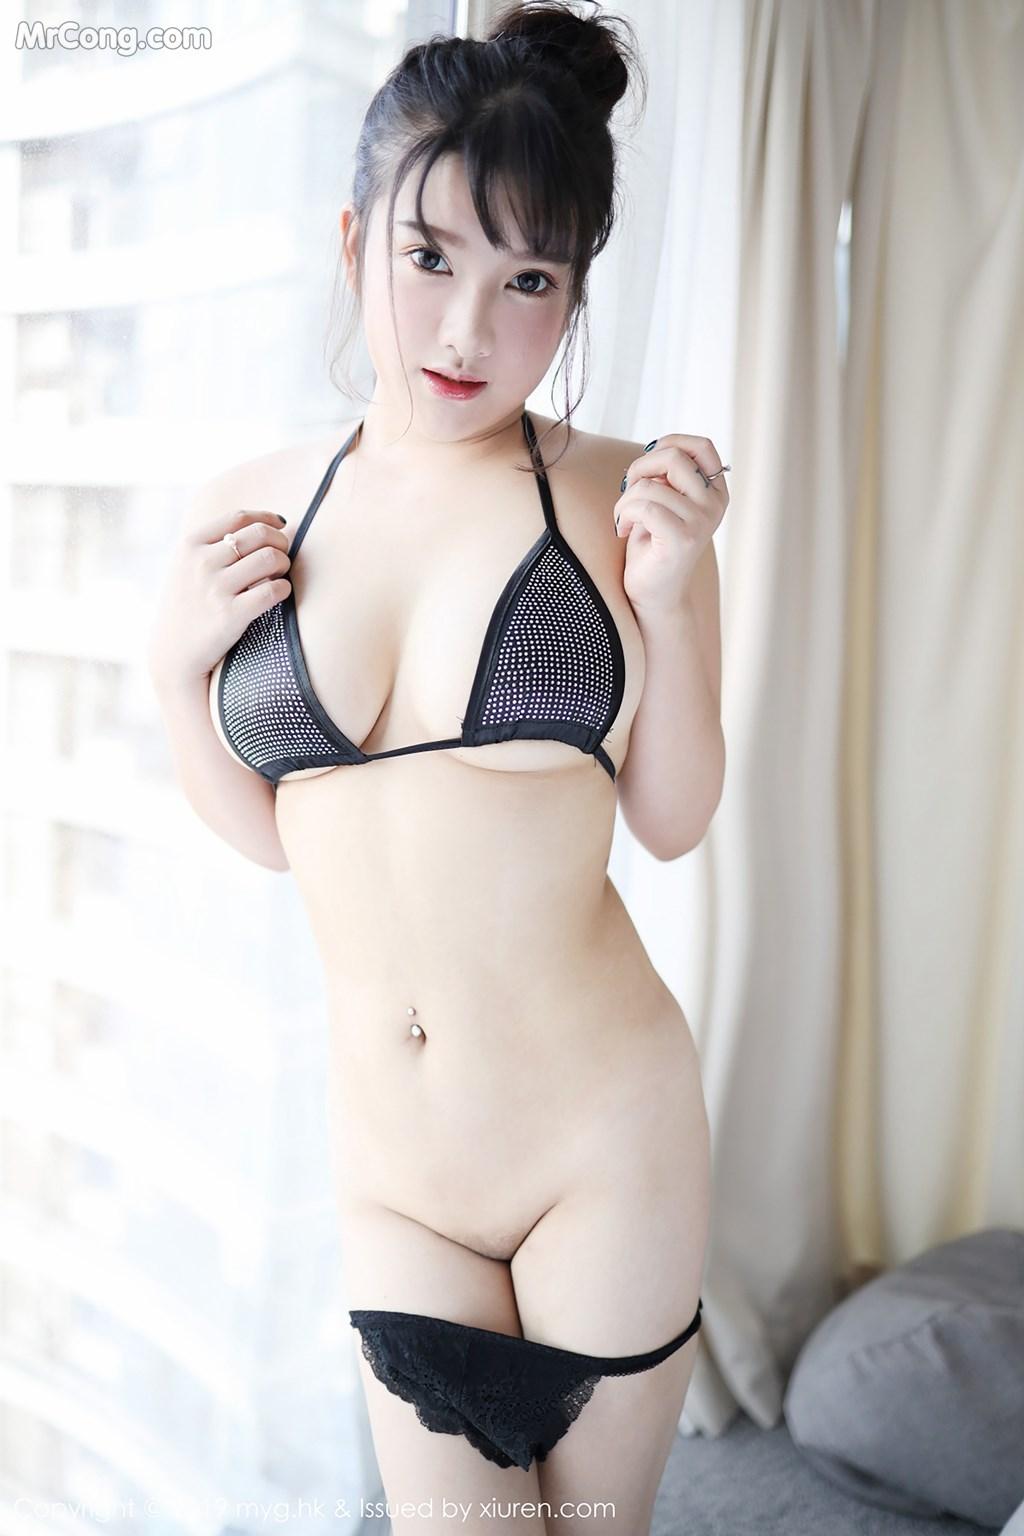 Image MyGirl-Vol.342-Xiao-You-Nai-MrCong.com-034 in post MyGirl Vol.342: Người mẫu Xiao You Nai (小尤奈) (41 ảnh)